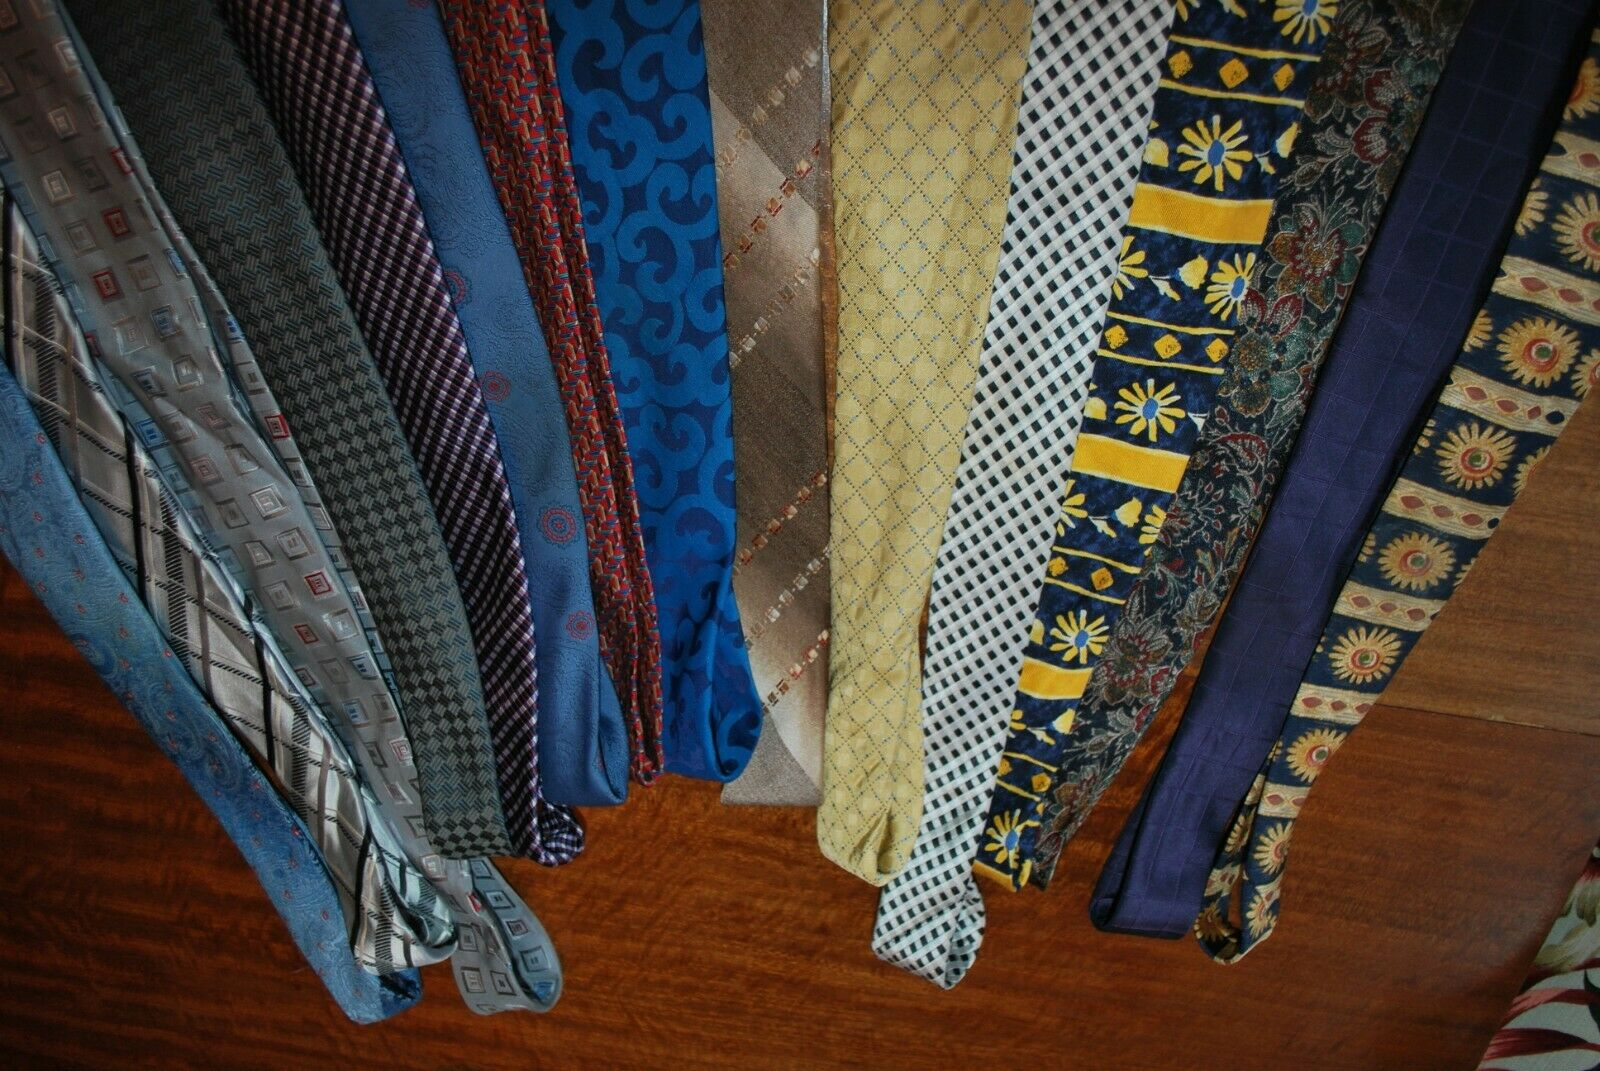 15 x various coloured patterned Tie's job lot bulk buy 15 vintage